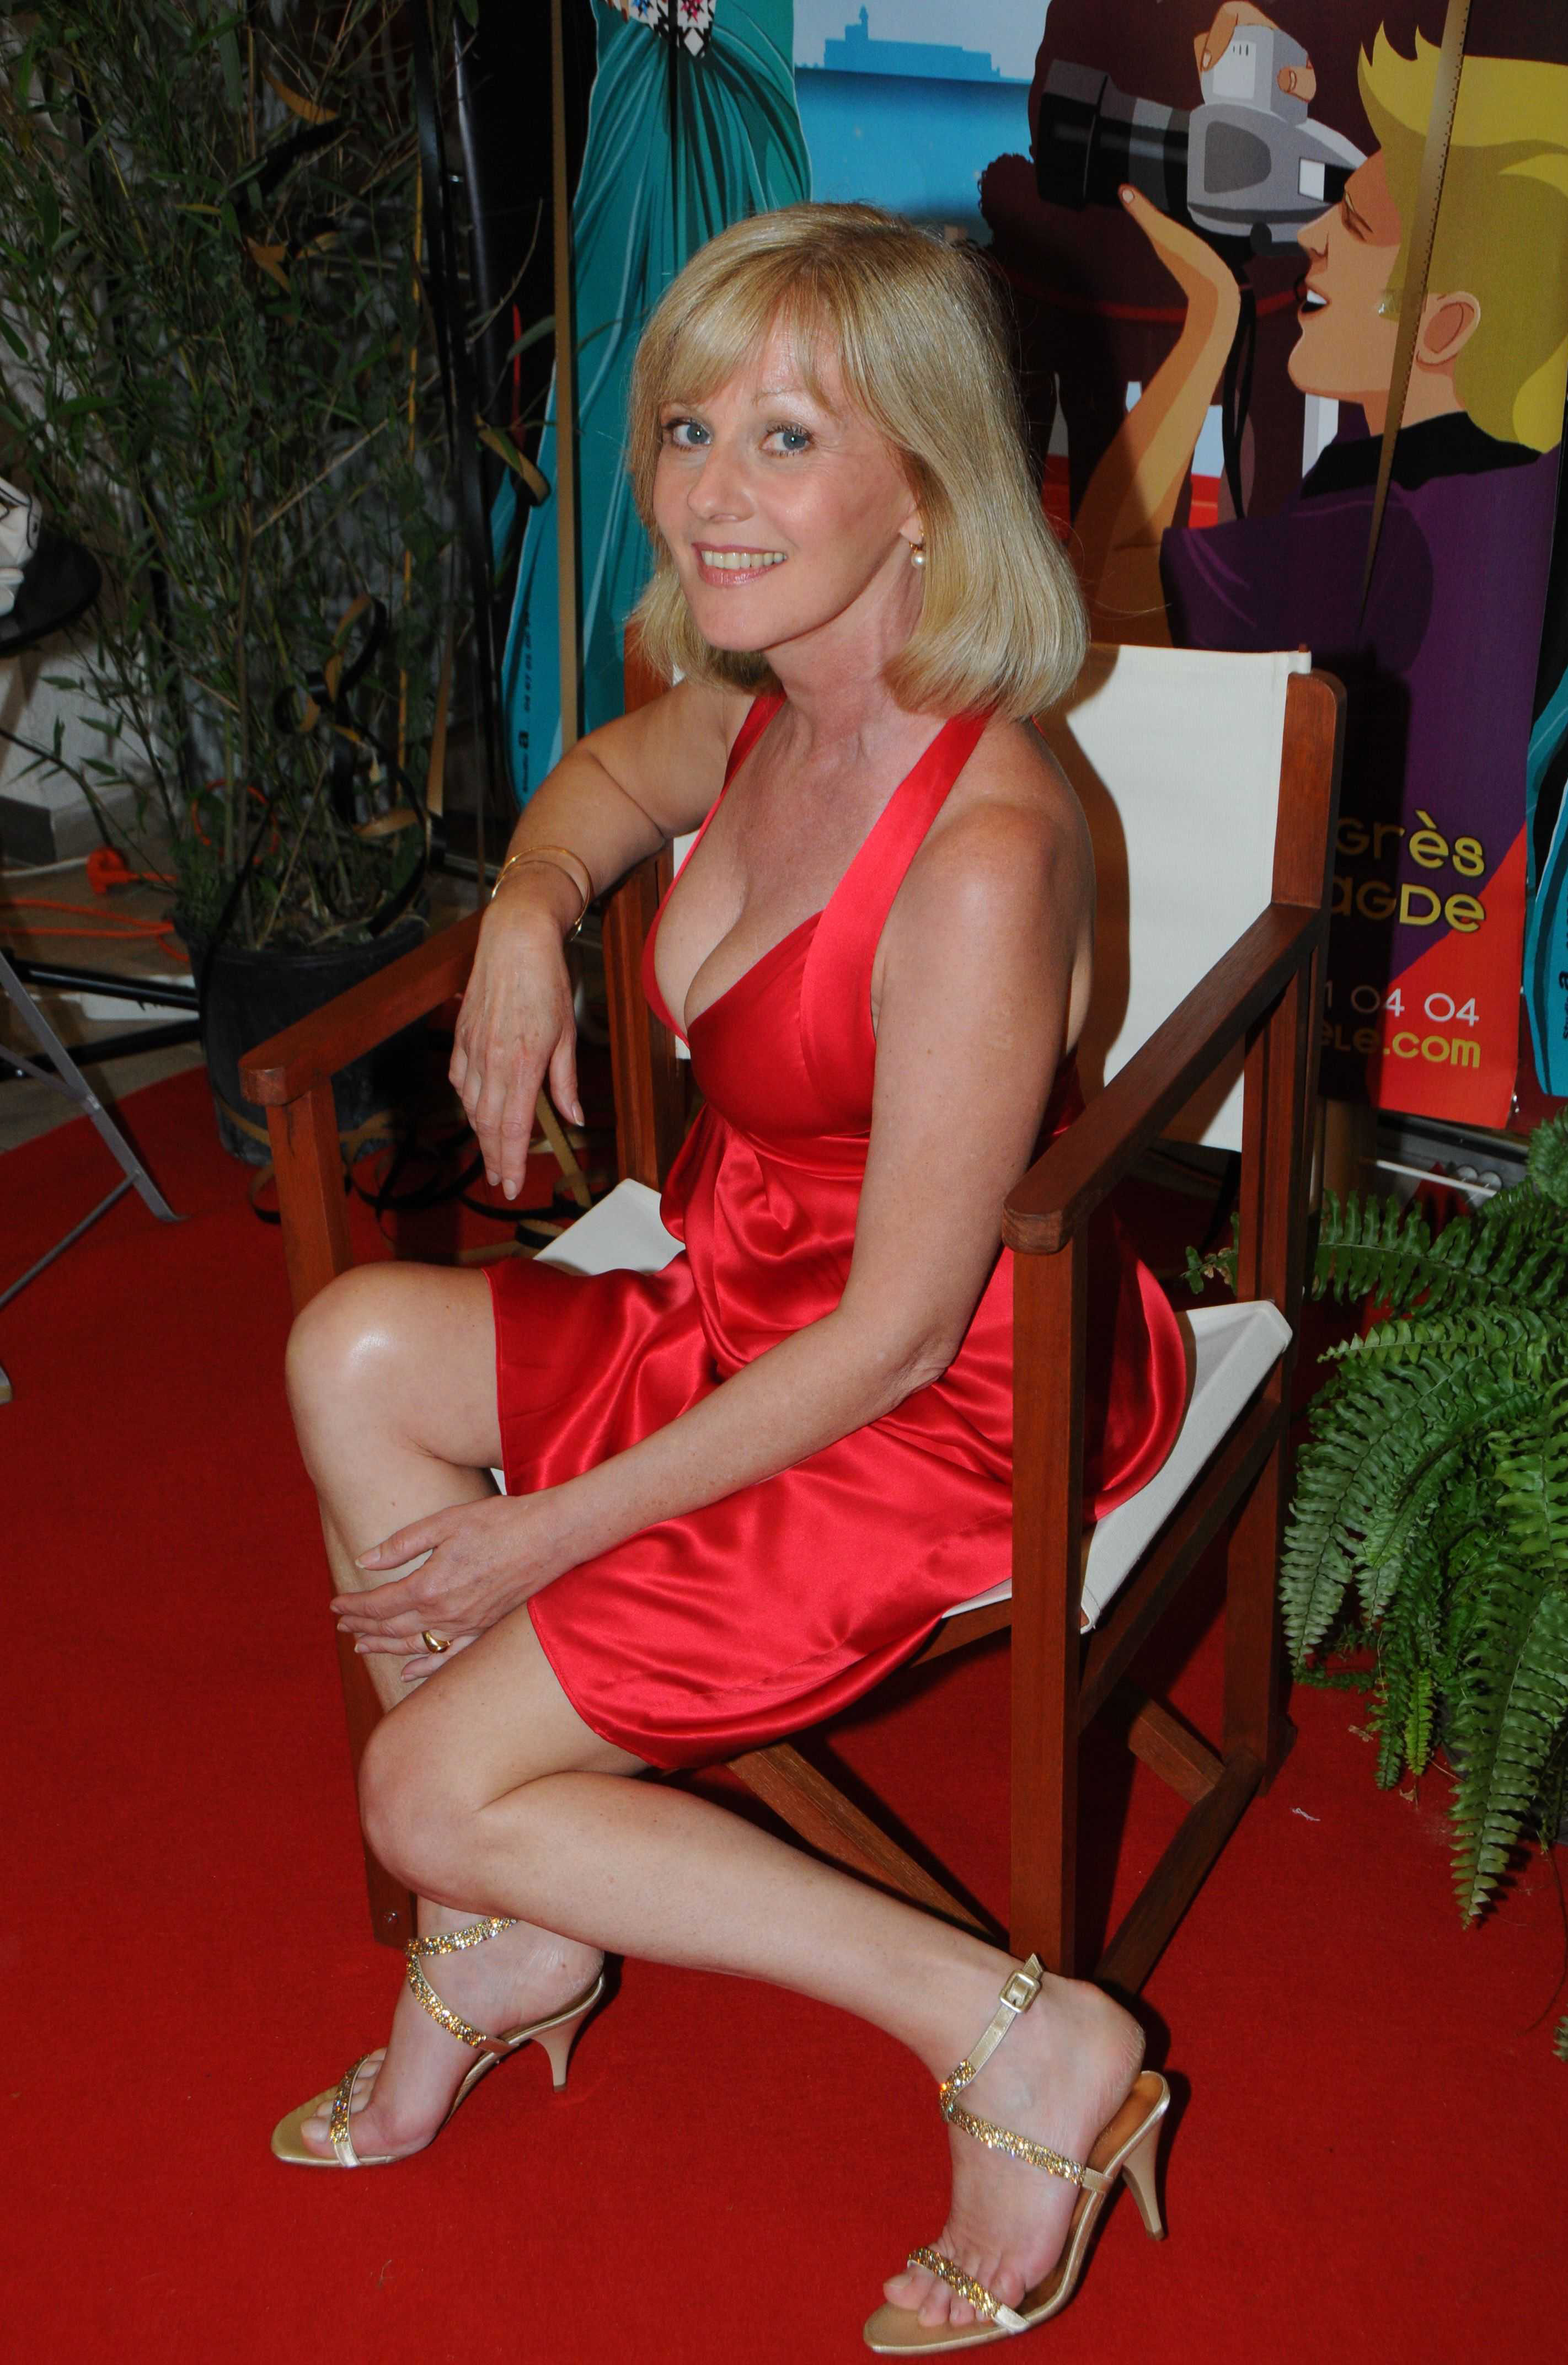 Cougar porno Femme Mature, Vieille salope et Jeunot : TuKif